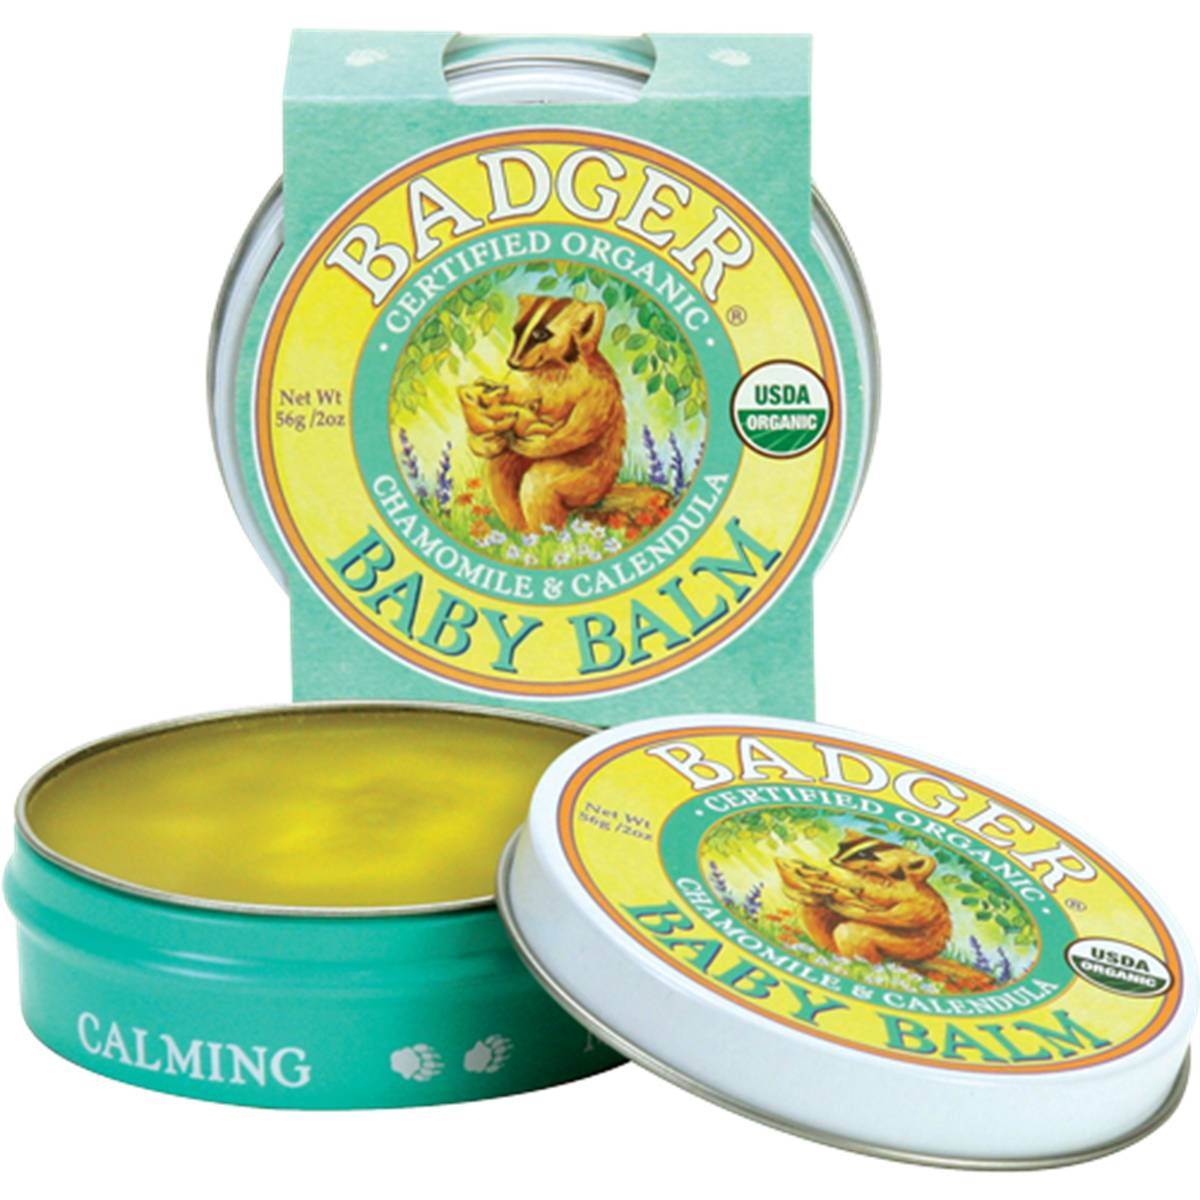 Badger Balm Badger Baby Balm, Liten 21g